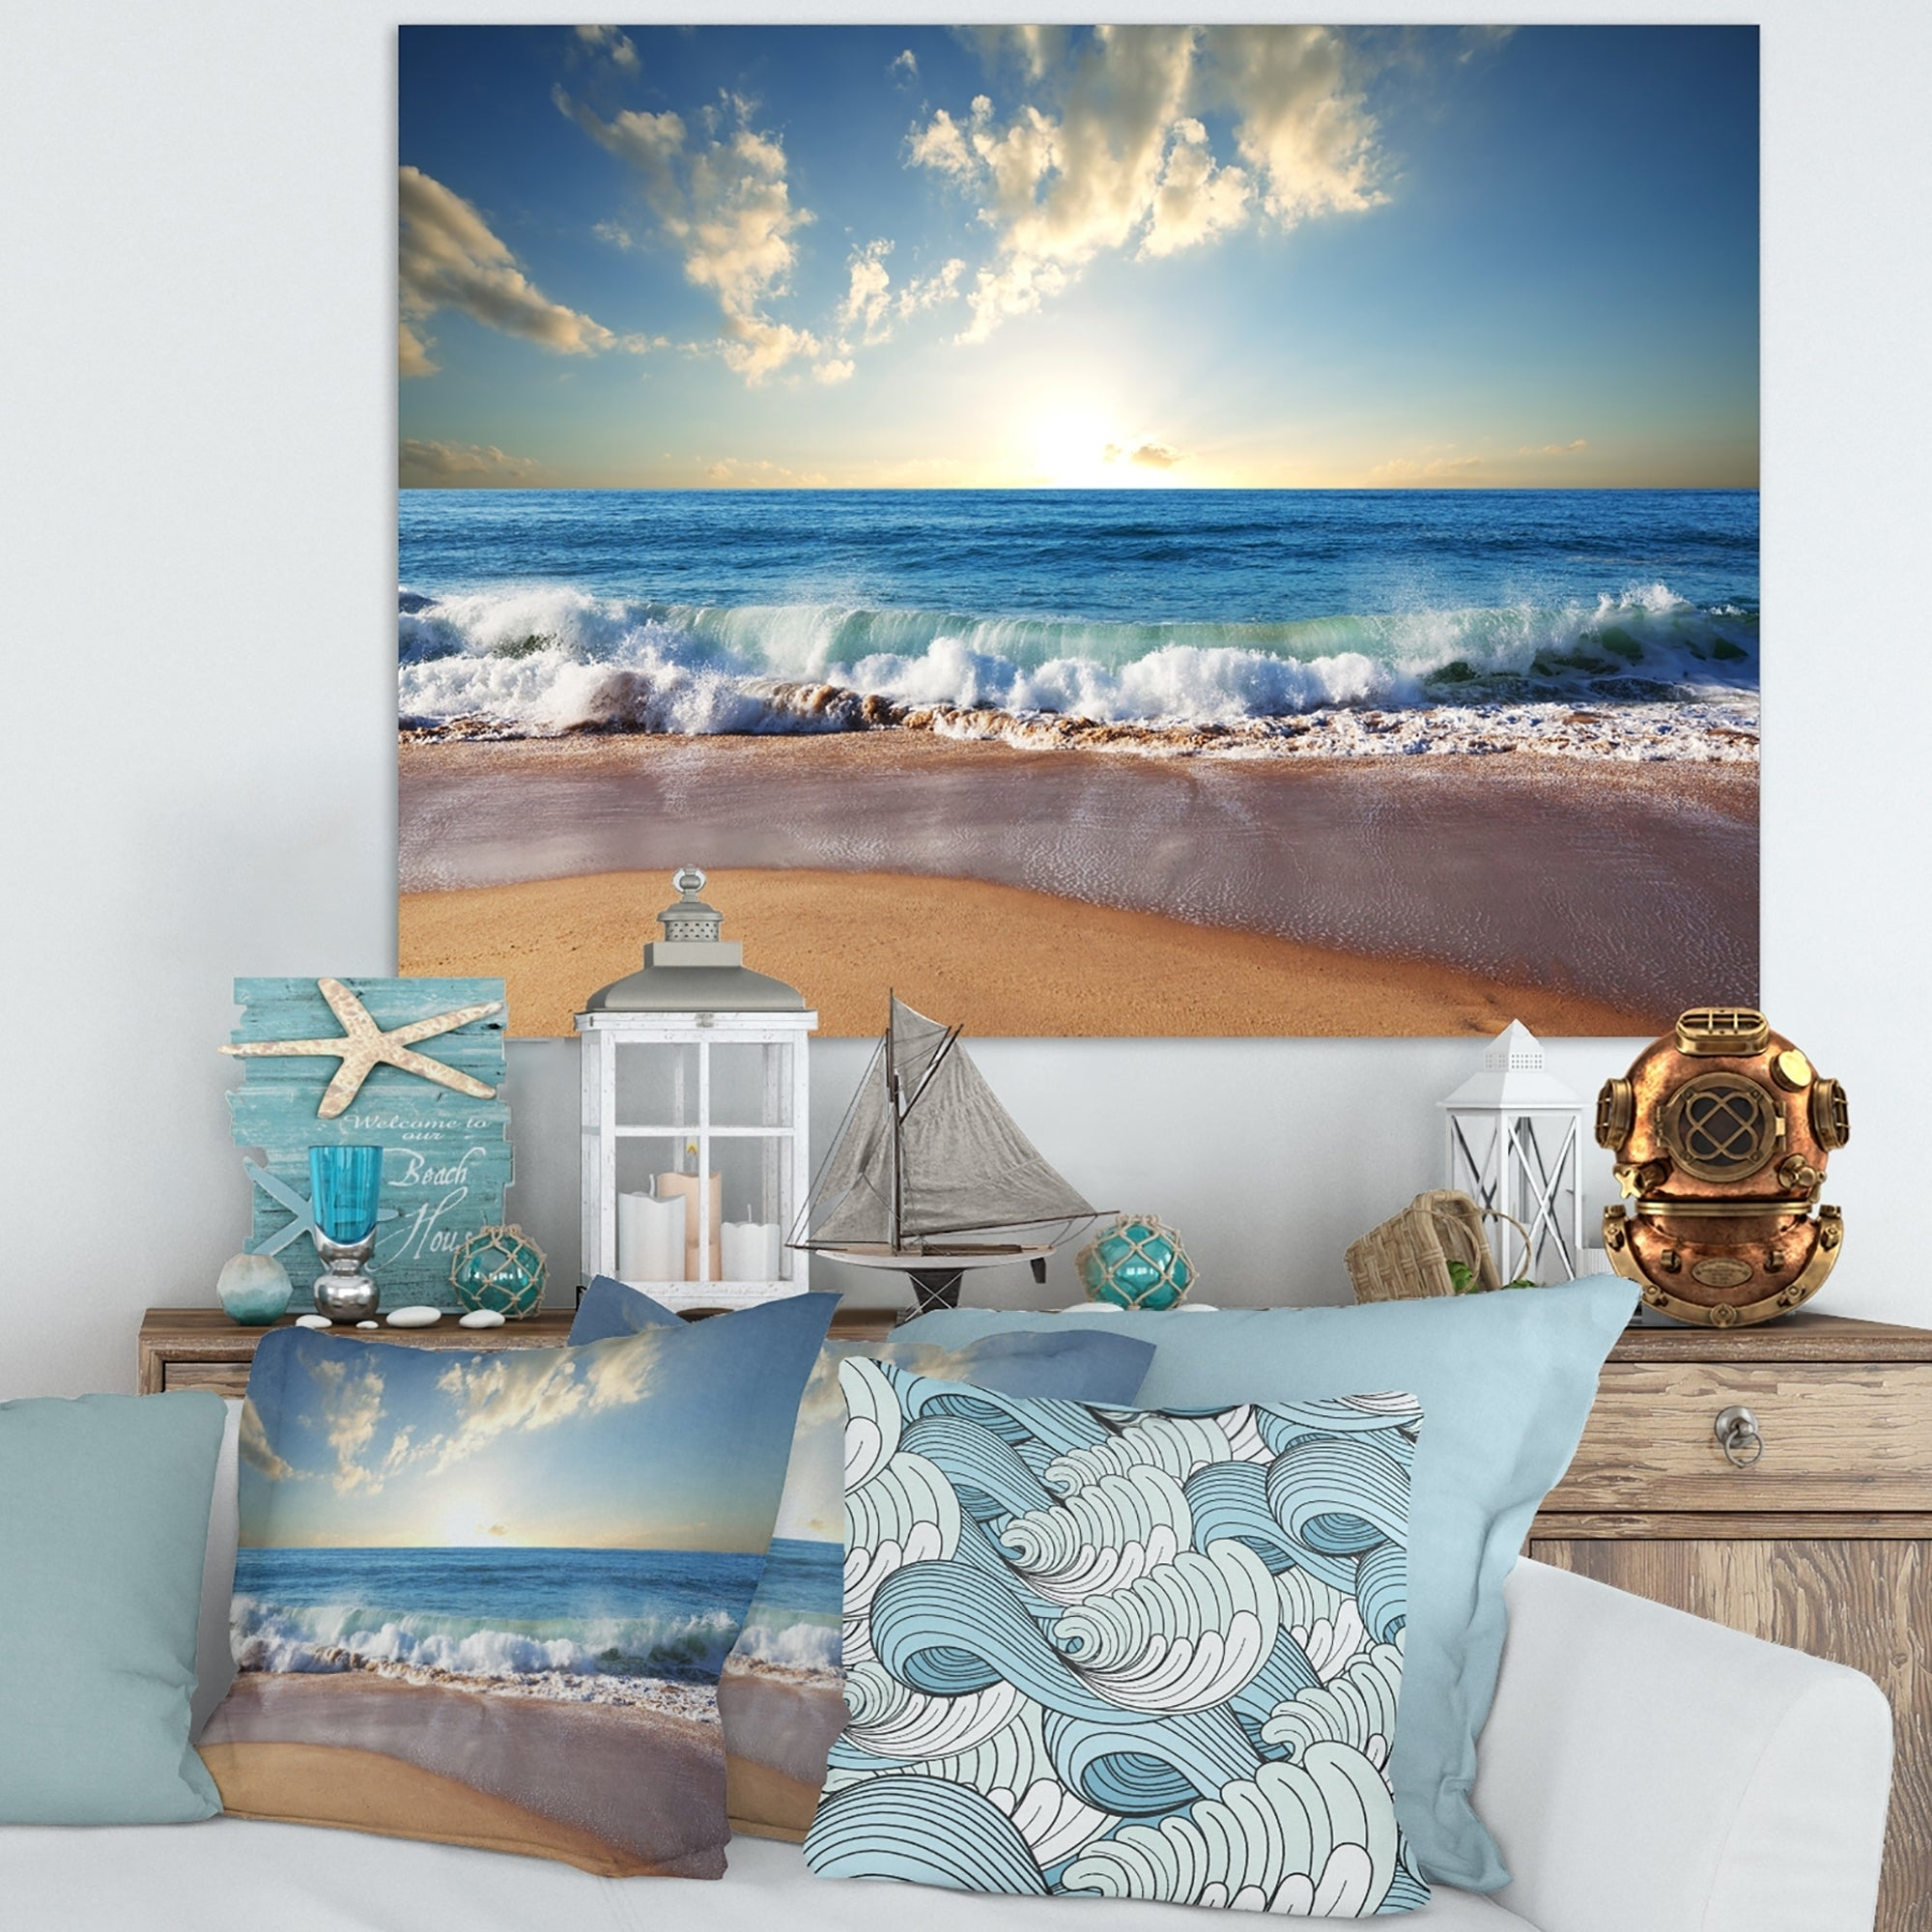 LARGE PHOTOGRAPHIC BEACH CANVAS ART PRINT SEASCAPE A1